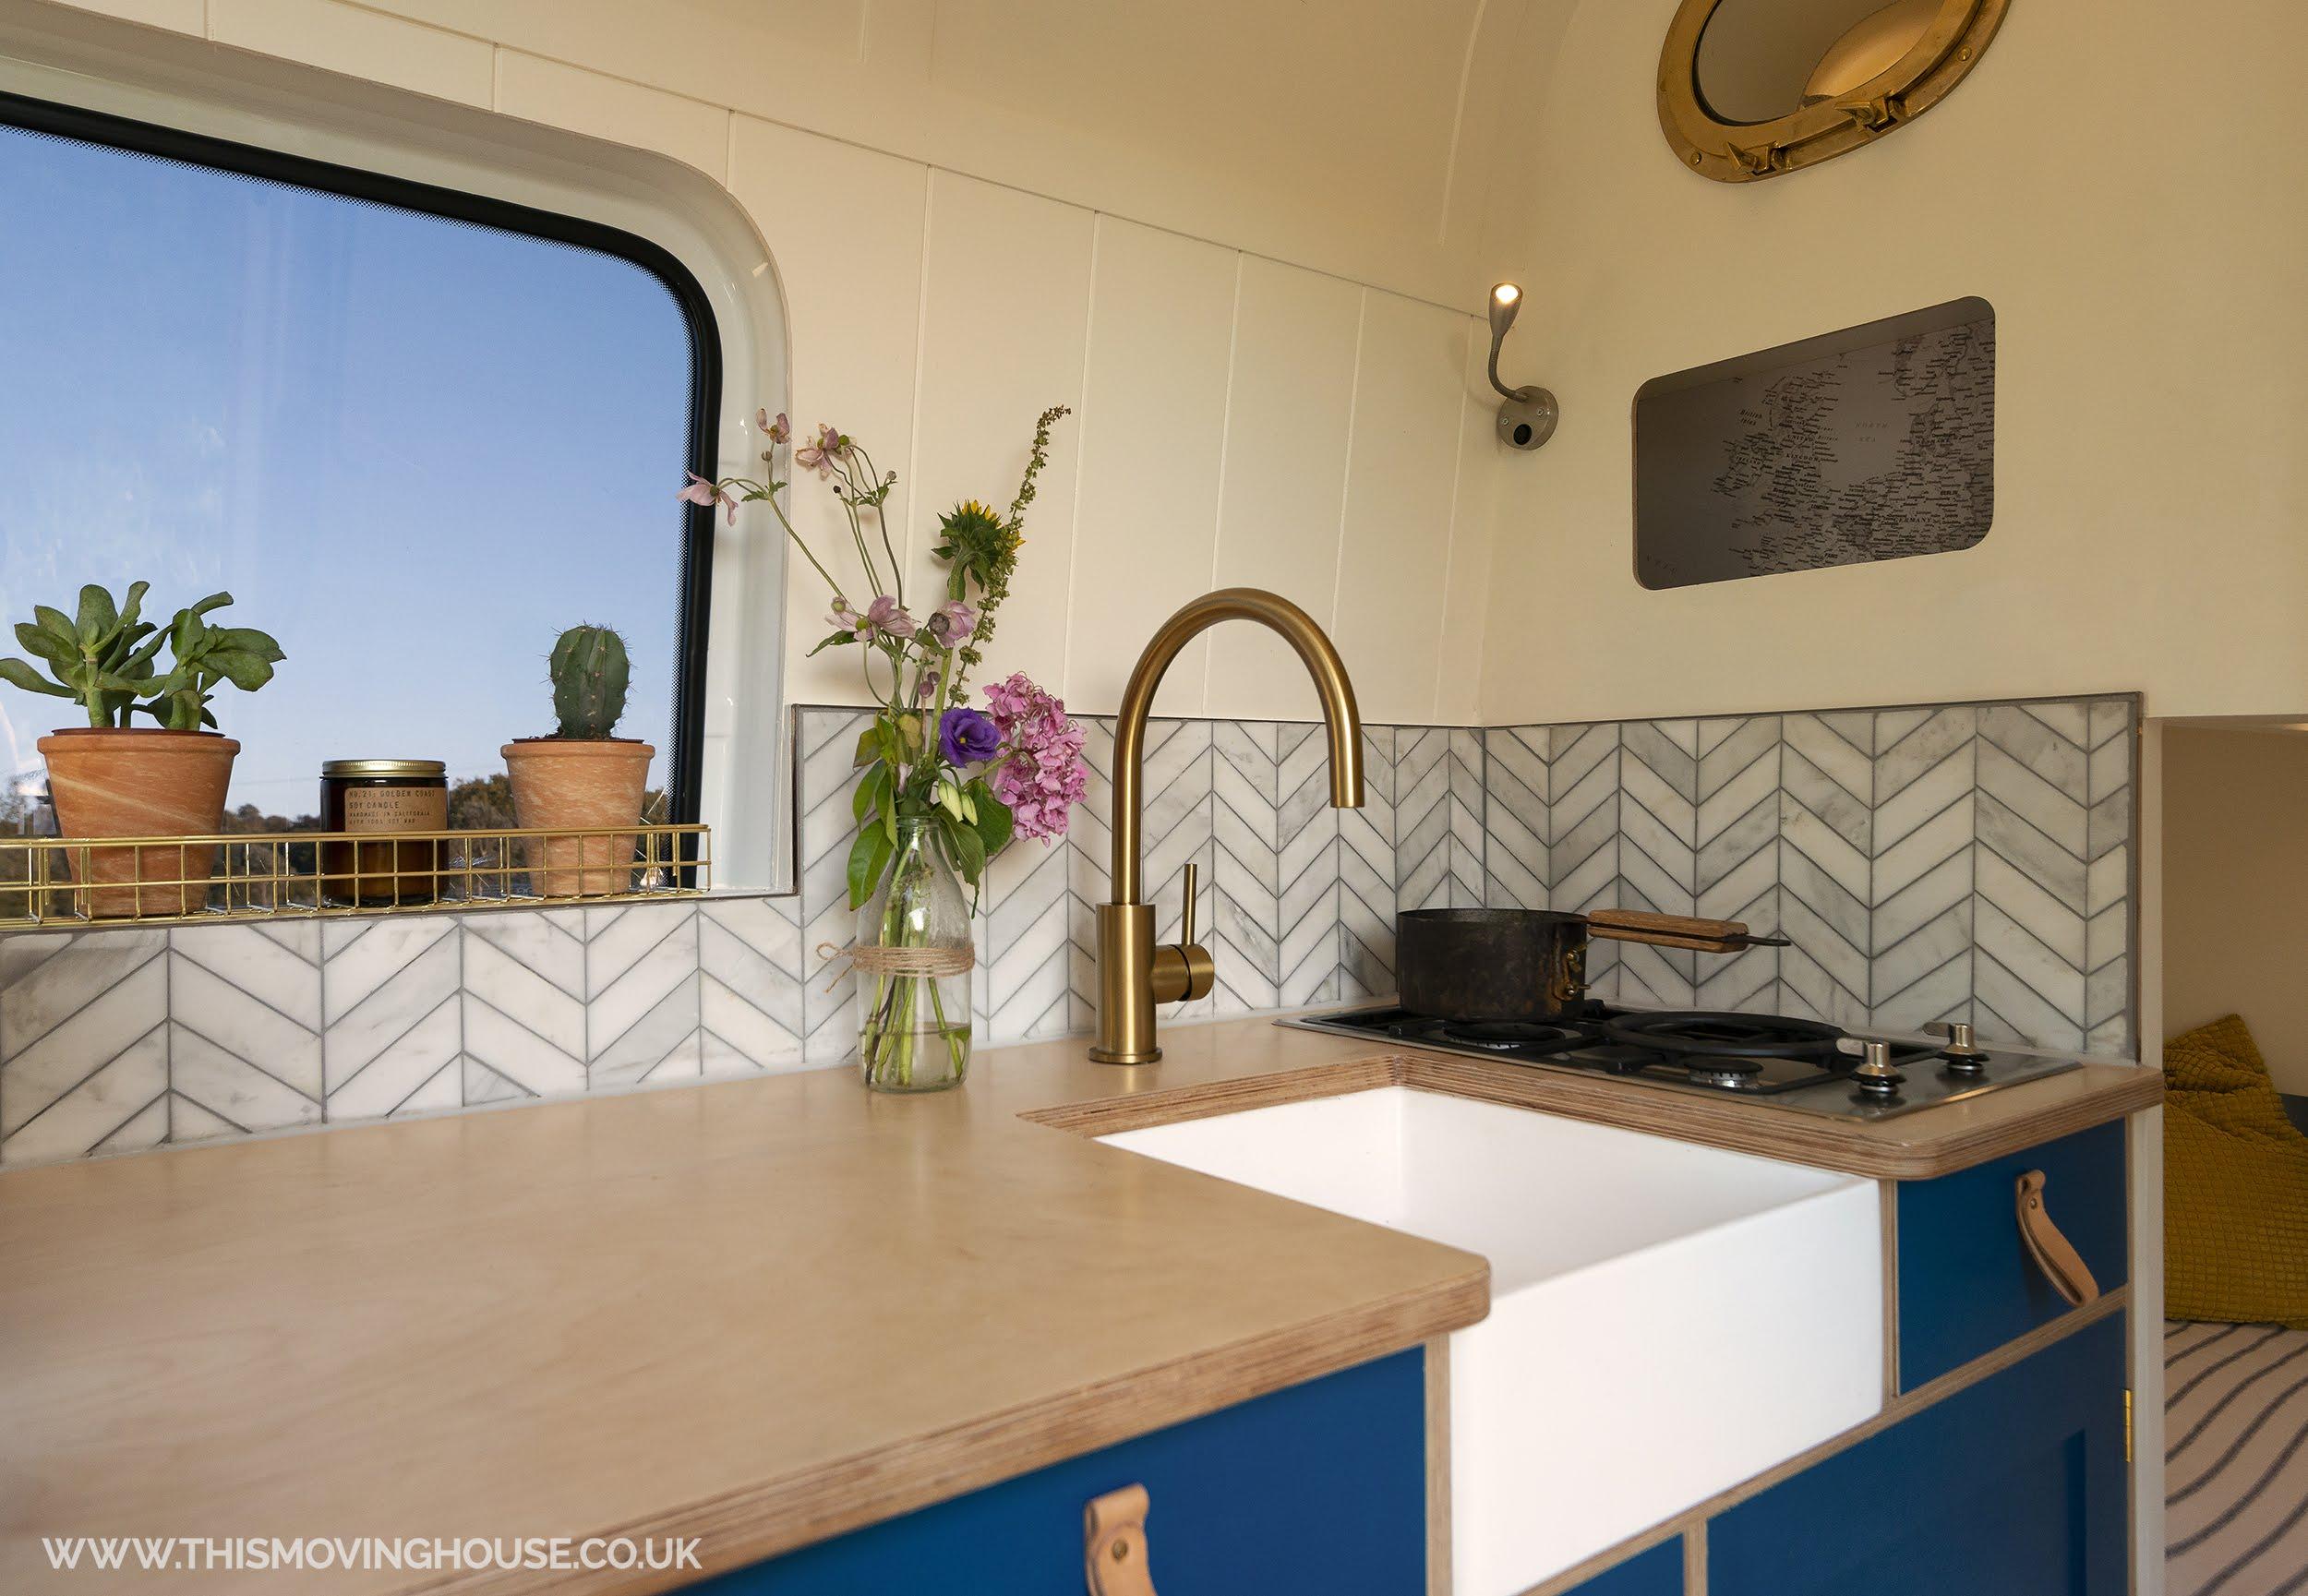 camper van kitchen with belfast sink and copper edge on backsplash